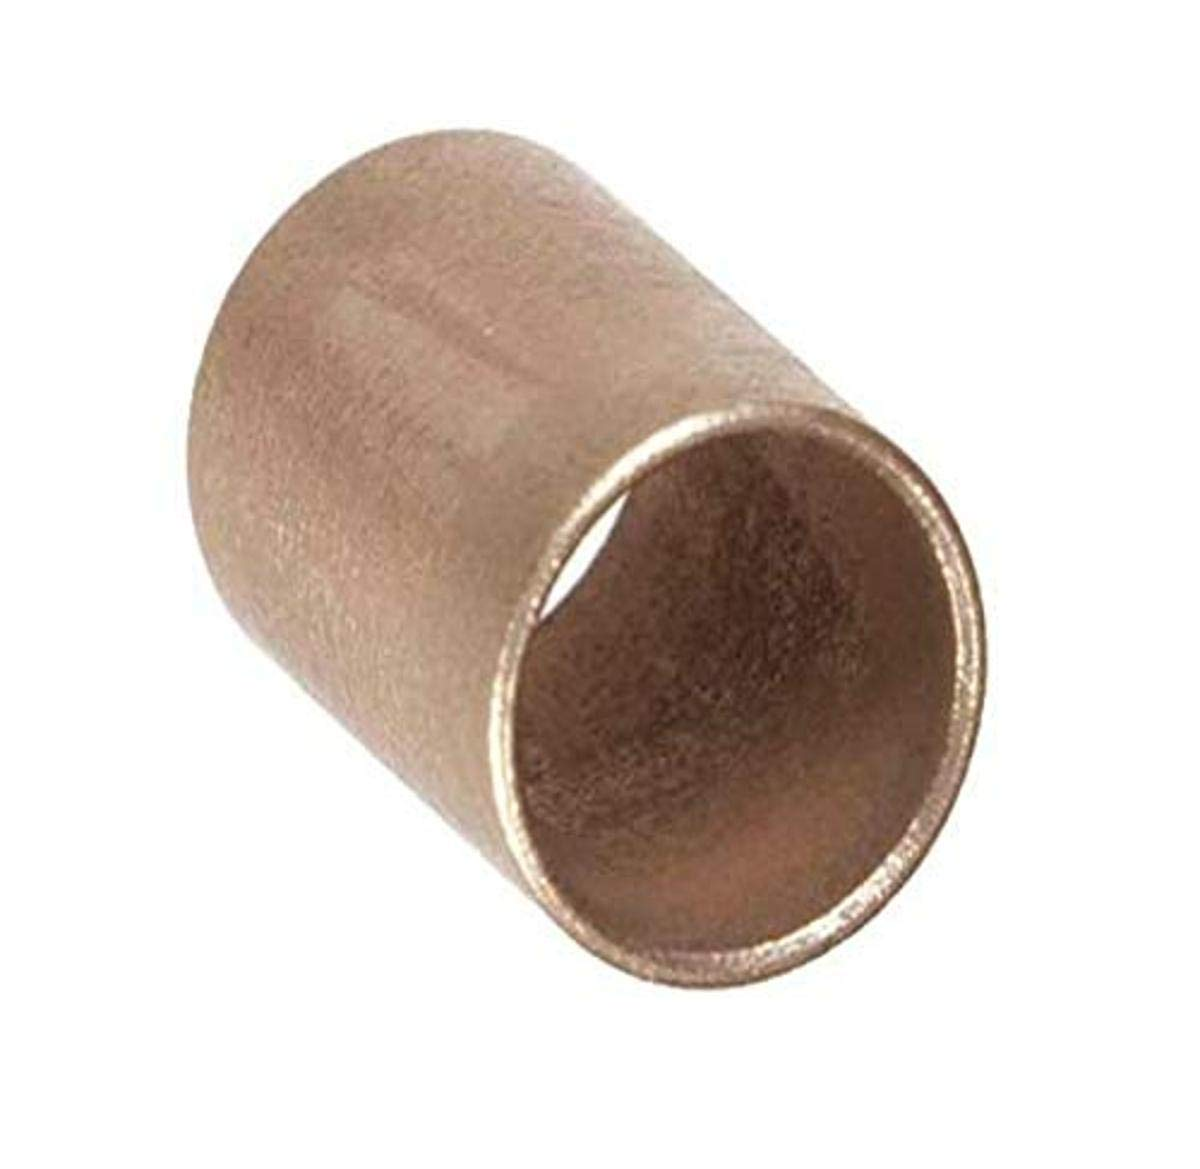 Isostatics 201027-10 EP040506 SAE841 Bronz Metal Cheap mail order sales discount Oilube Powdered